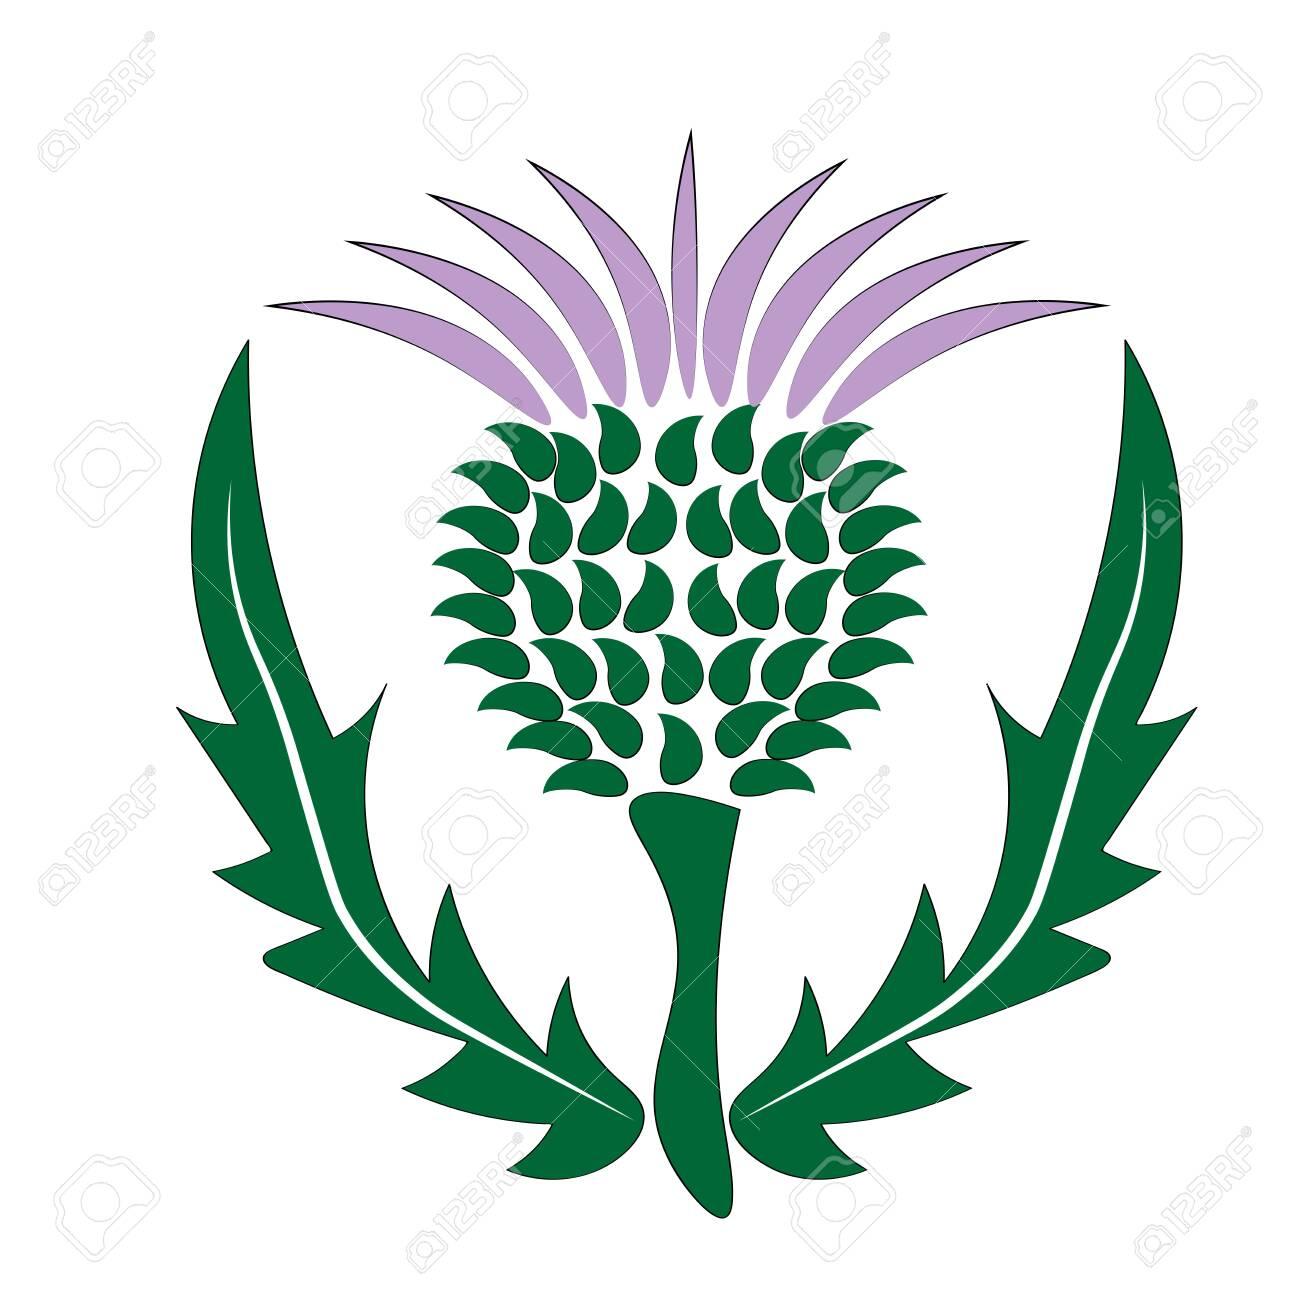 thistle Scotland symbol and emblem - 131837741